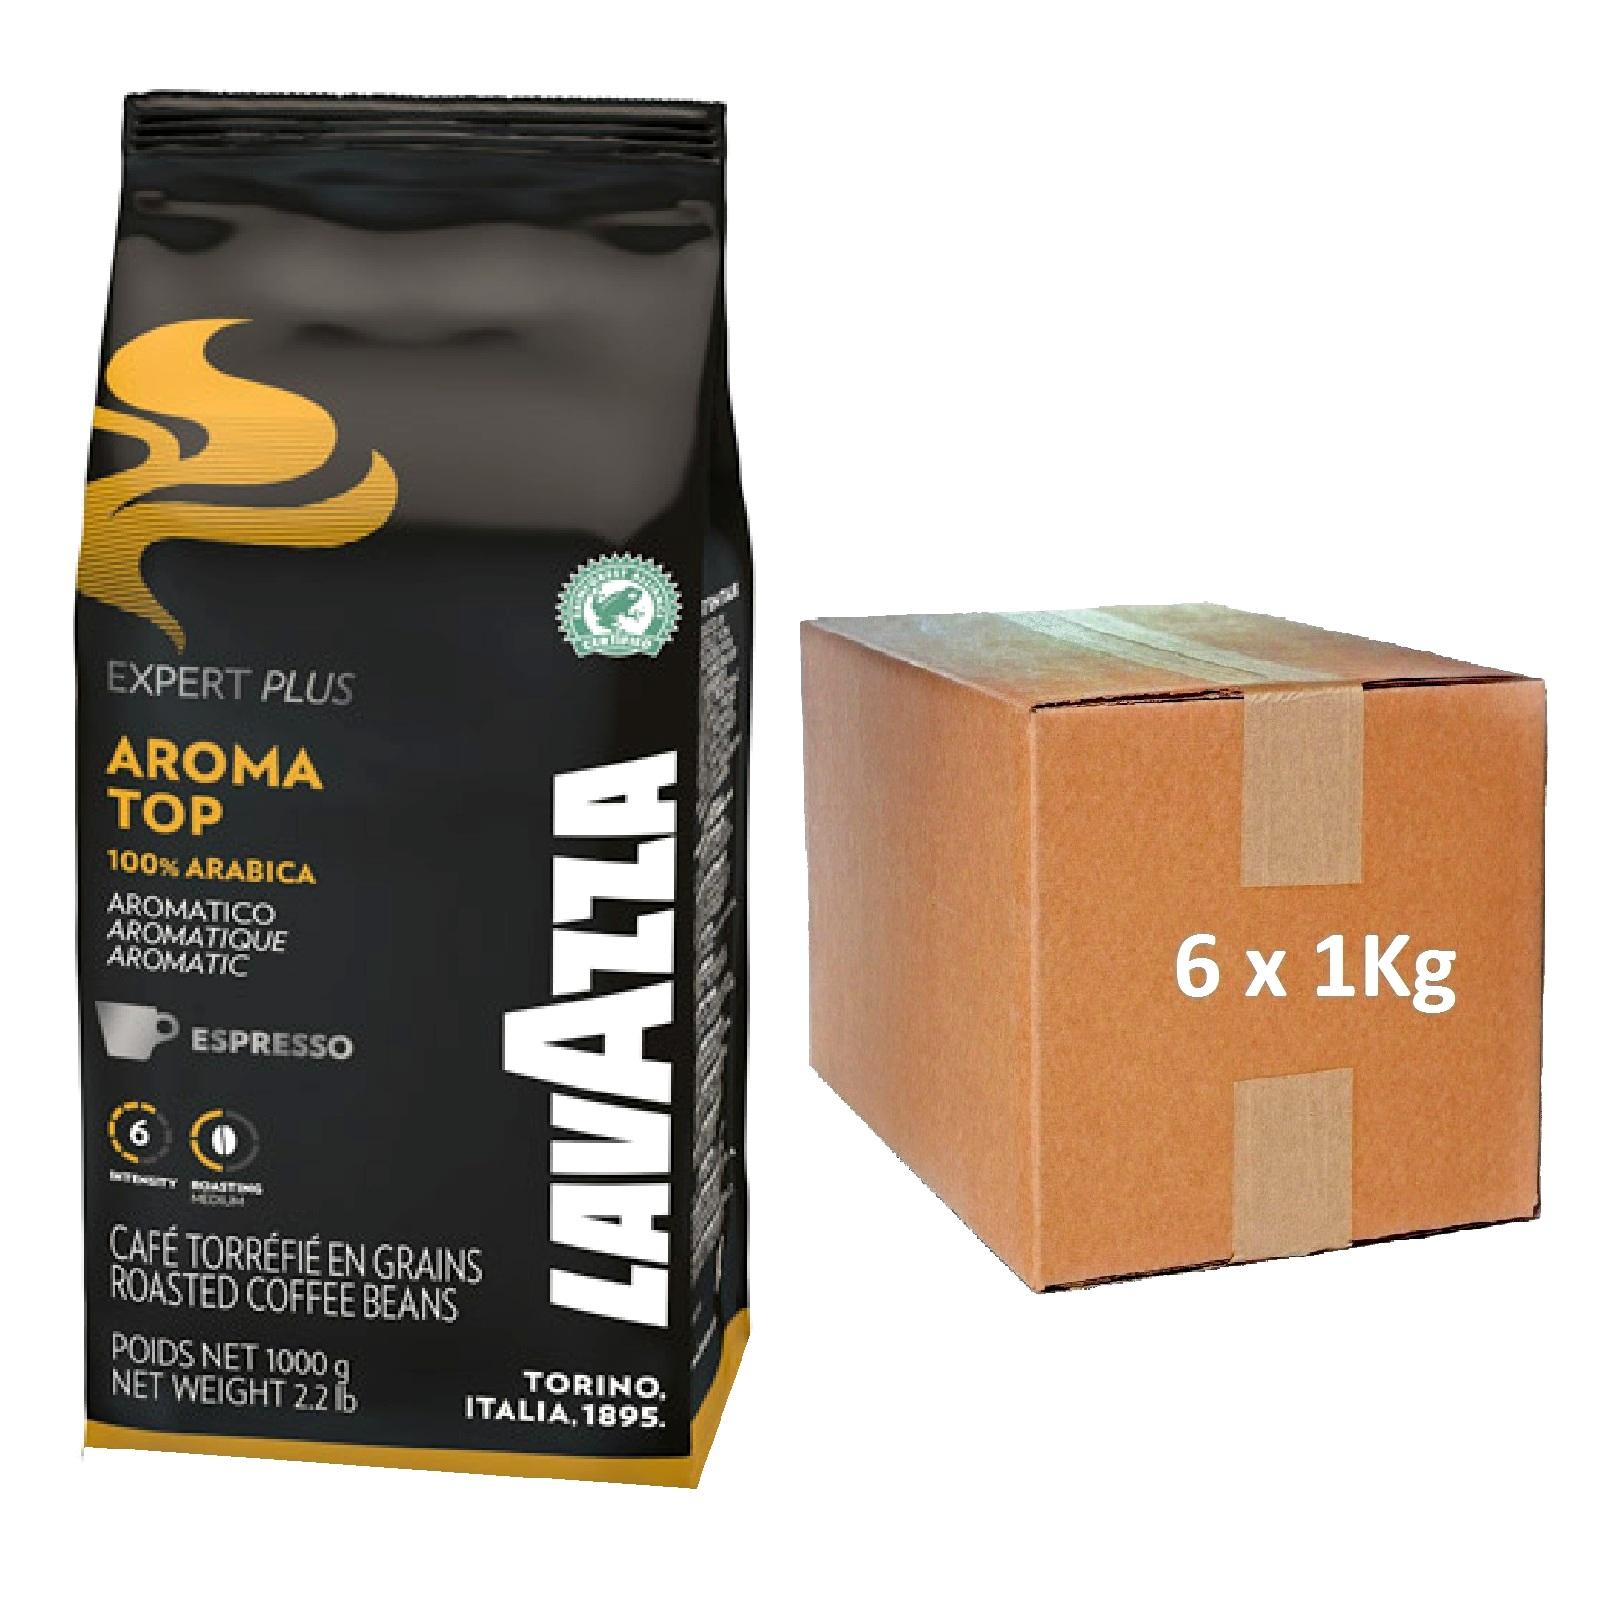 Lavazza Vending Aroma Top 100 % Arabica ganze Bohne 6 x 1Kg